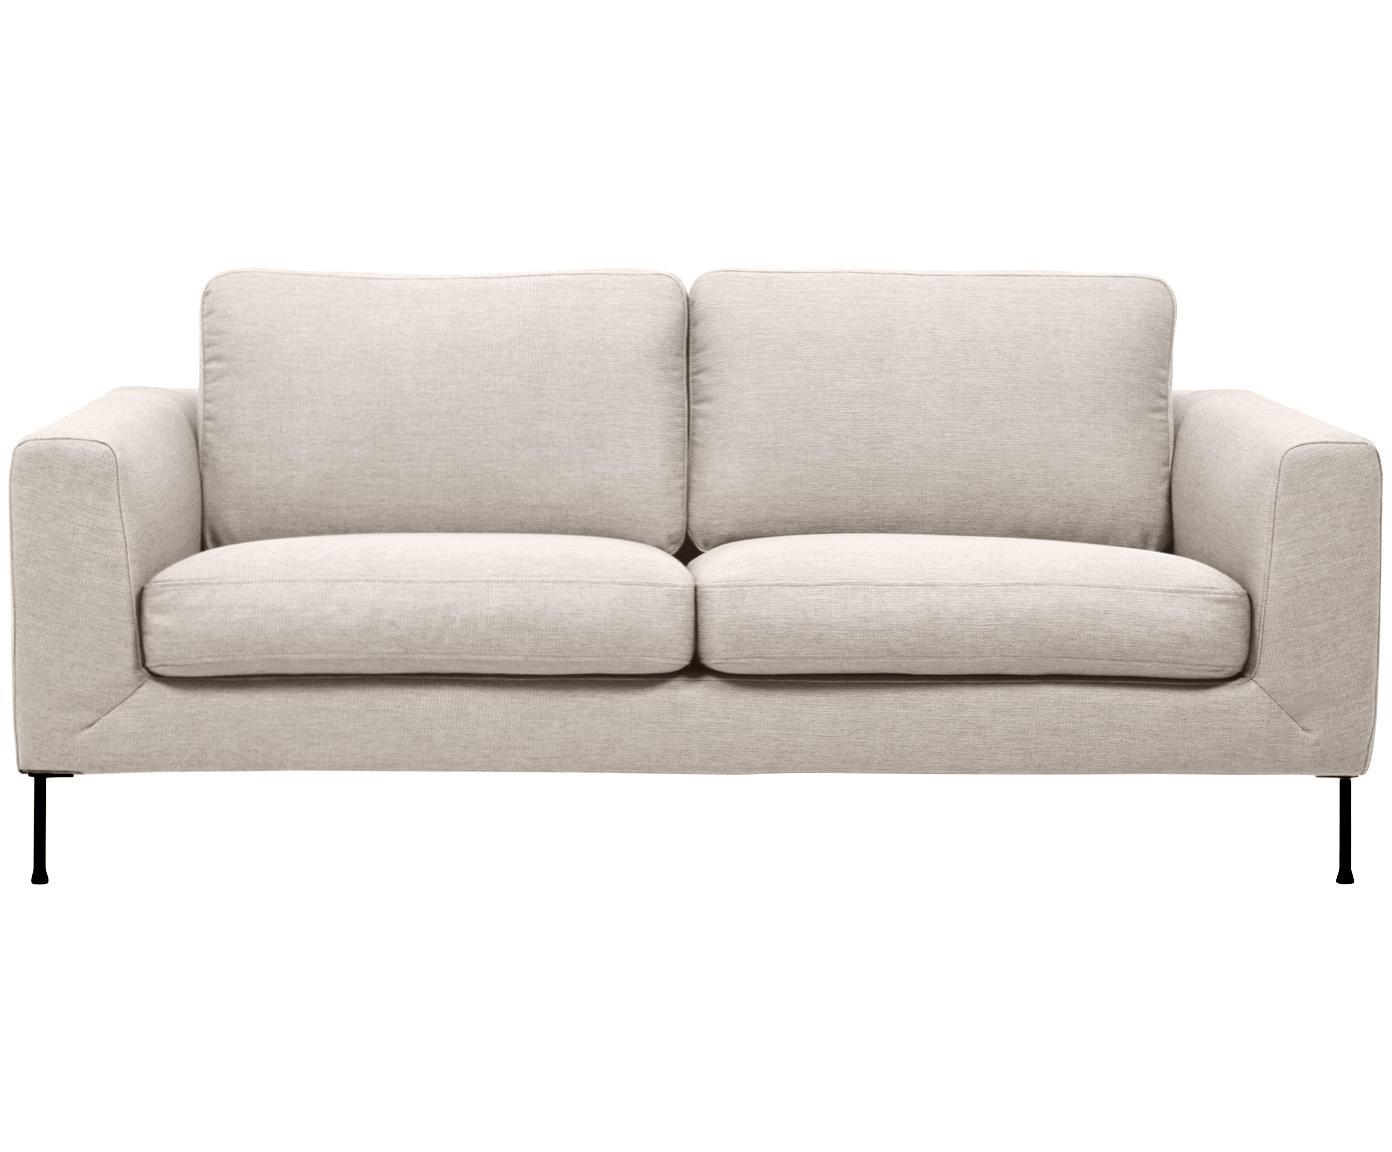 Sofa Cucita (2-Sitzer), Bezug: Webstoff (Polyester) 100., Gestell: Massives Kiefernholz, Webstoff Beige, B 187 x T 94 cm